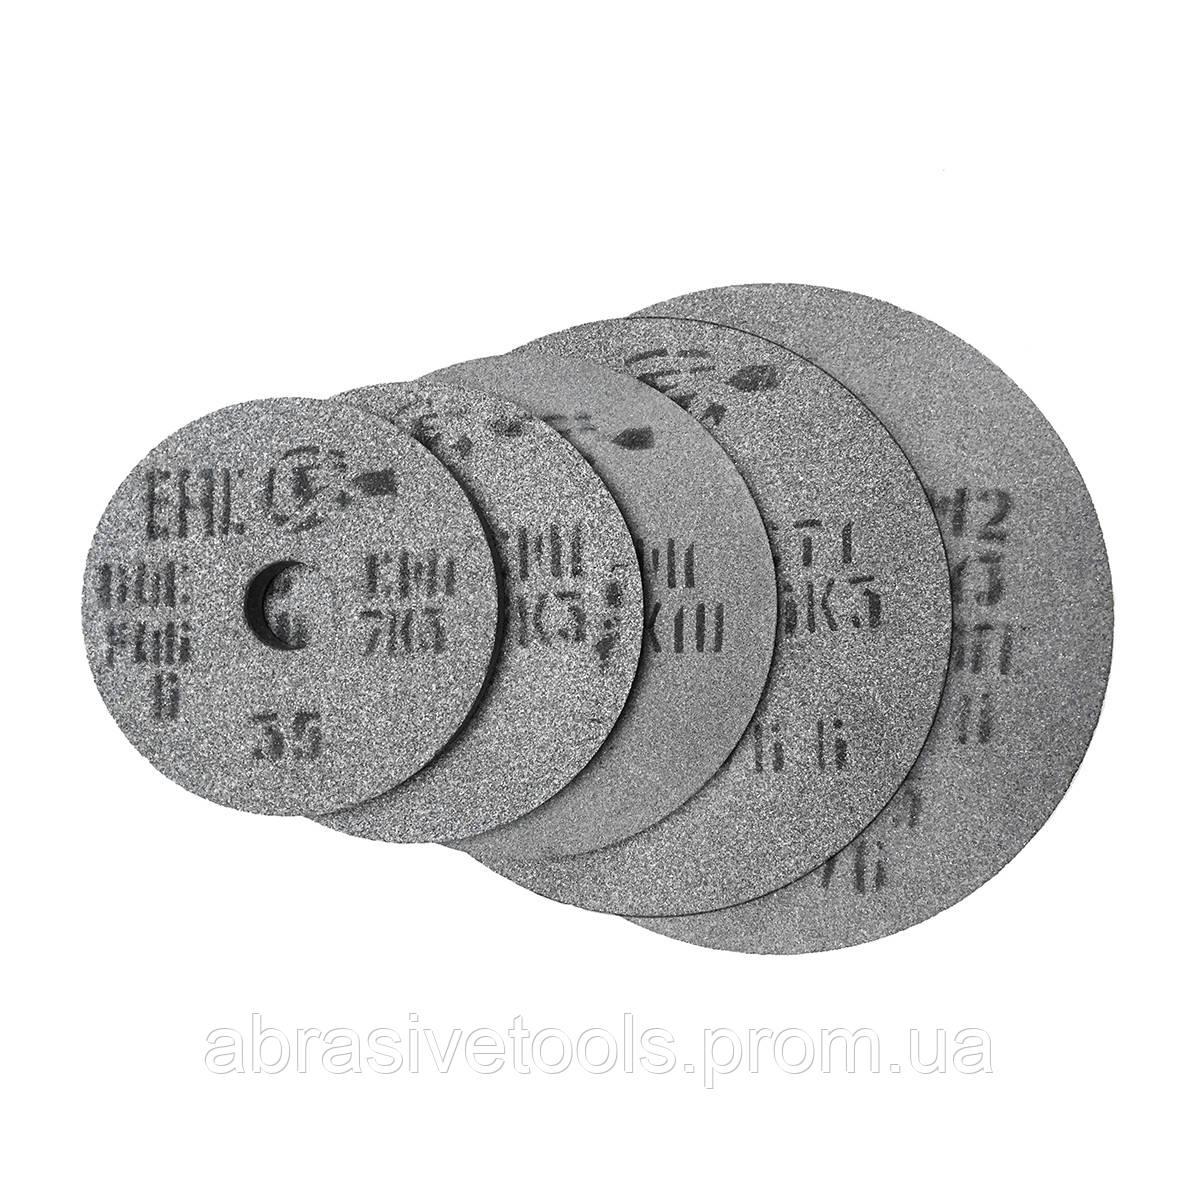 Круг шлифовальный 14A 500х63х305  F46 СМ